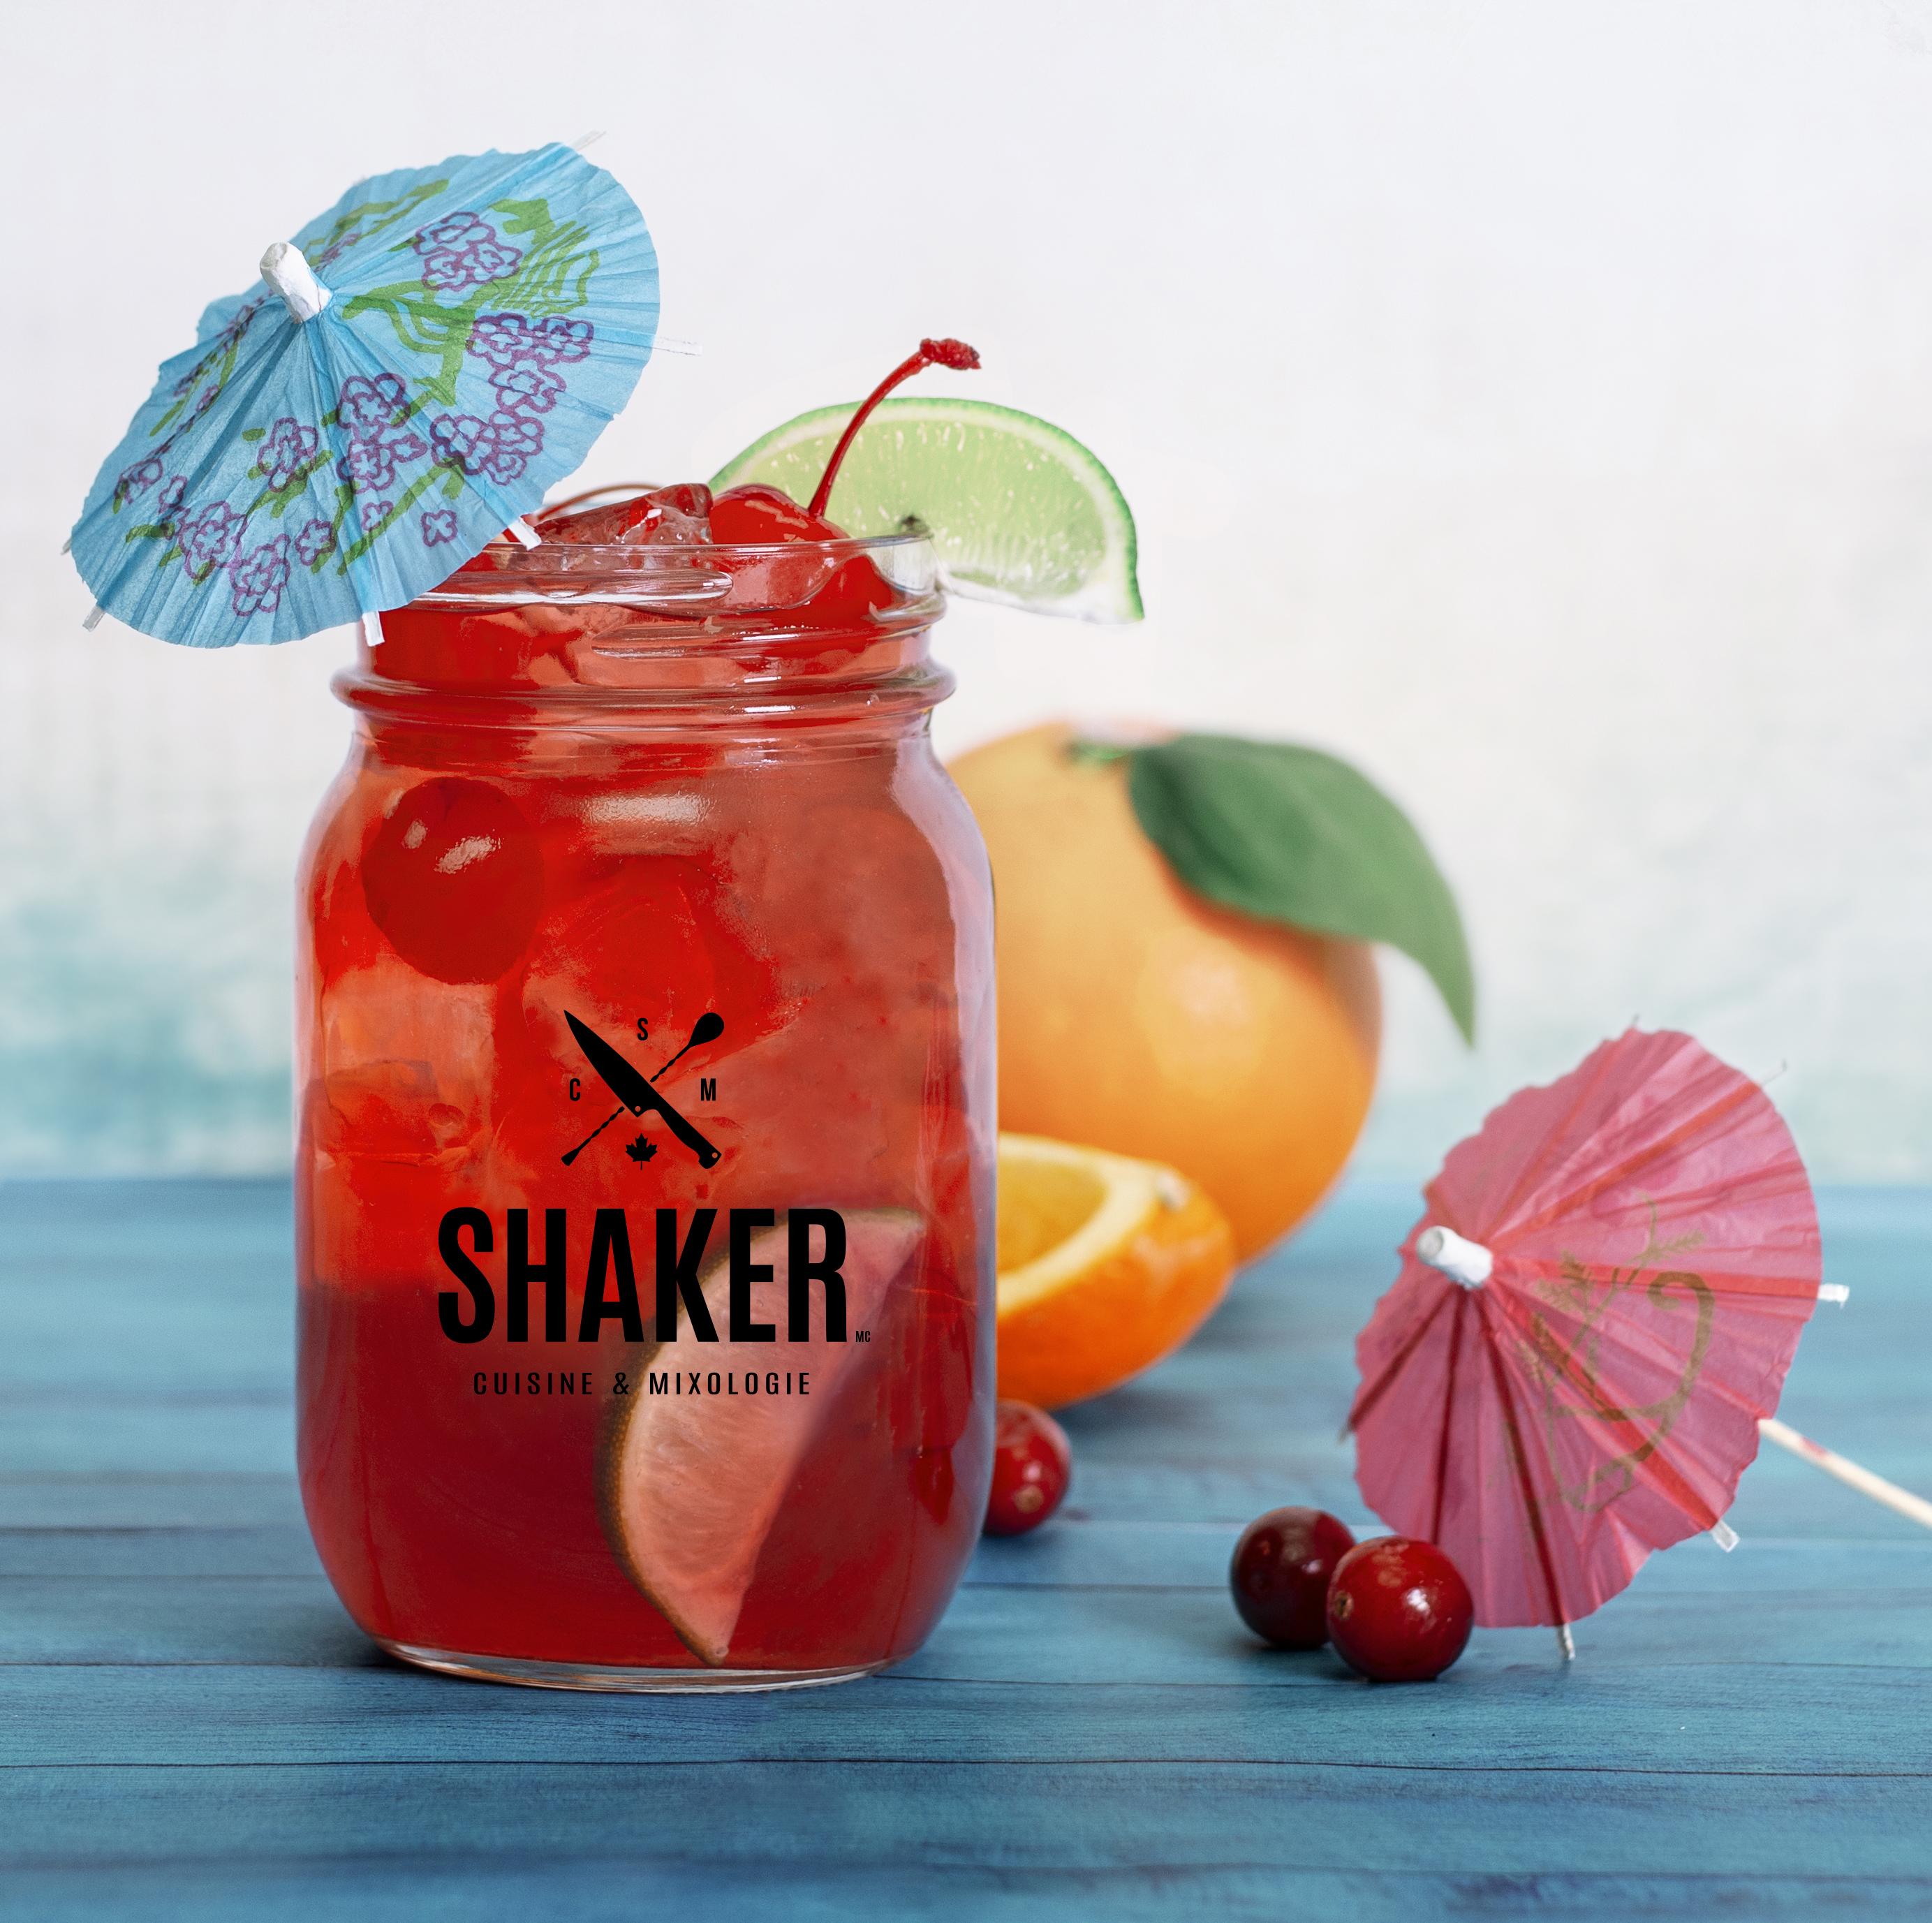 https://www.shakercuisineetmixologie.com/files/2019/06/2019_02_cocktail_merry_poppins_carre_home.jpg